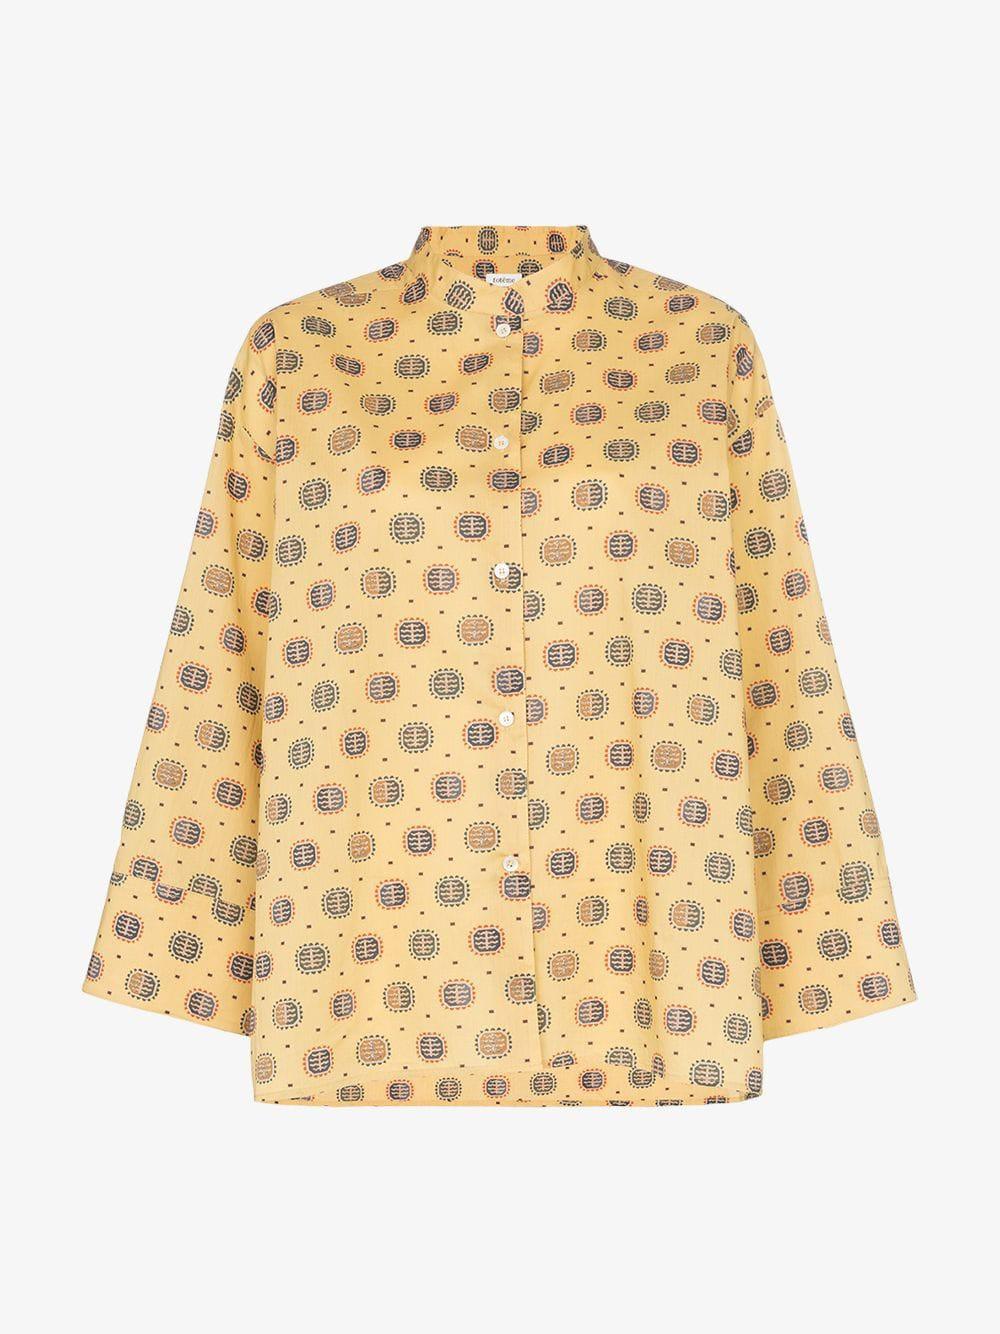 Toteme Zahora printed cotton long sleeve shirt in yellow / print